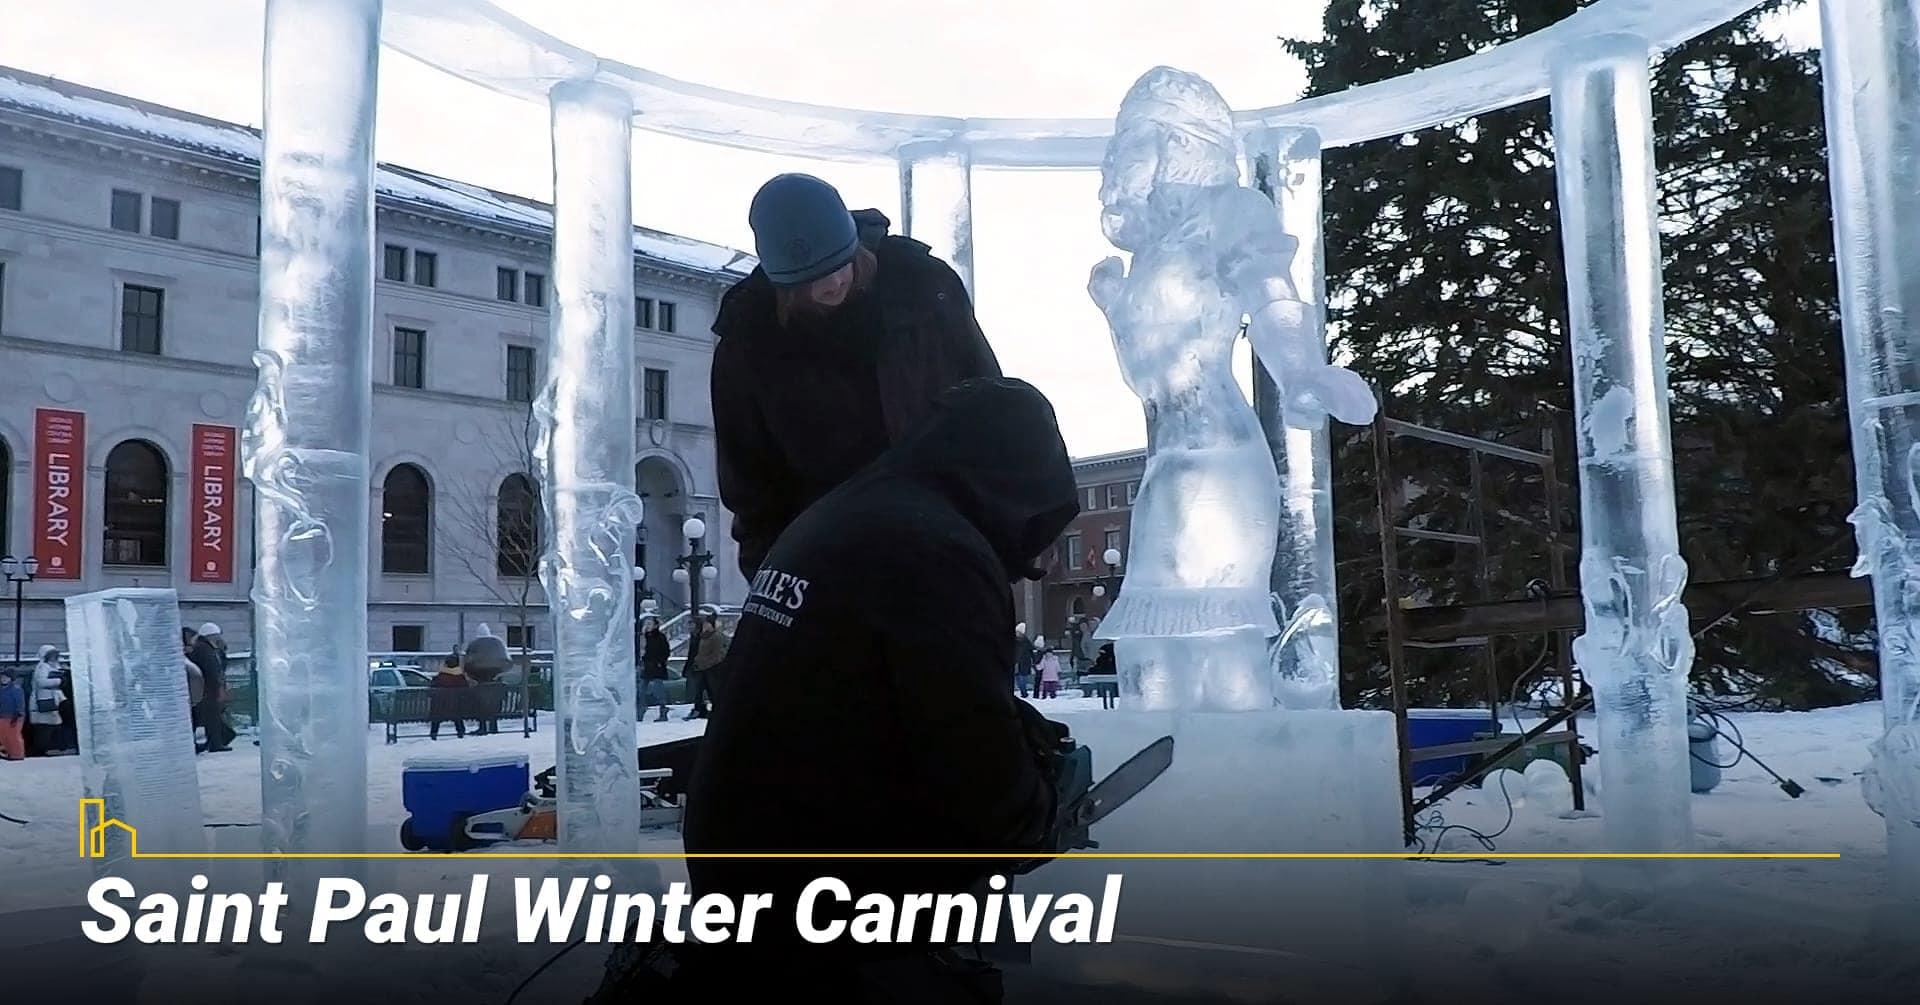 Saint Paul Winter Carnival, ice sculptures winter carnival